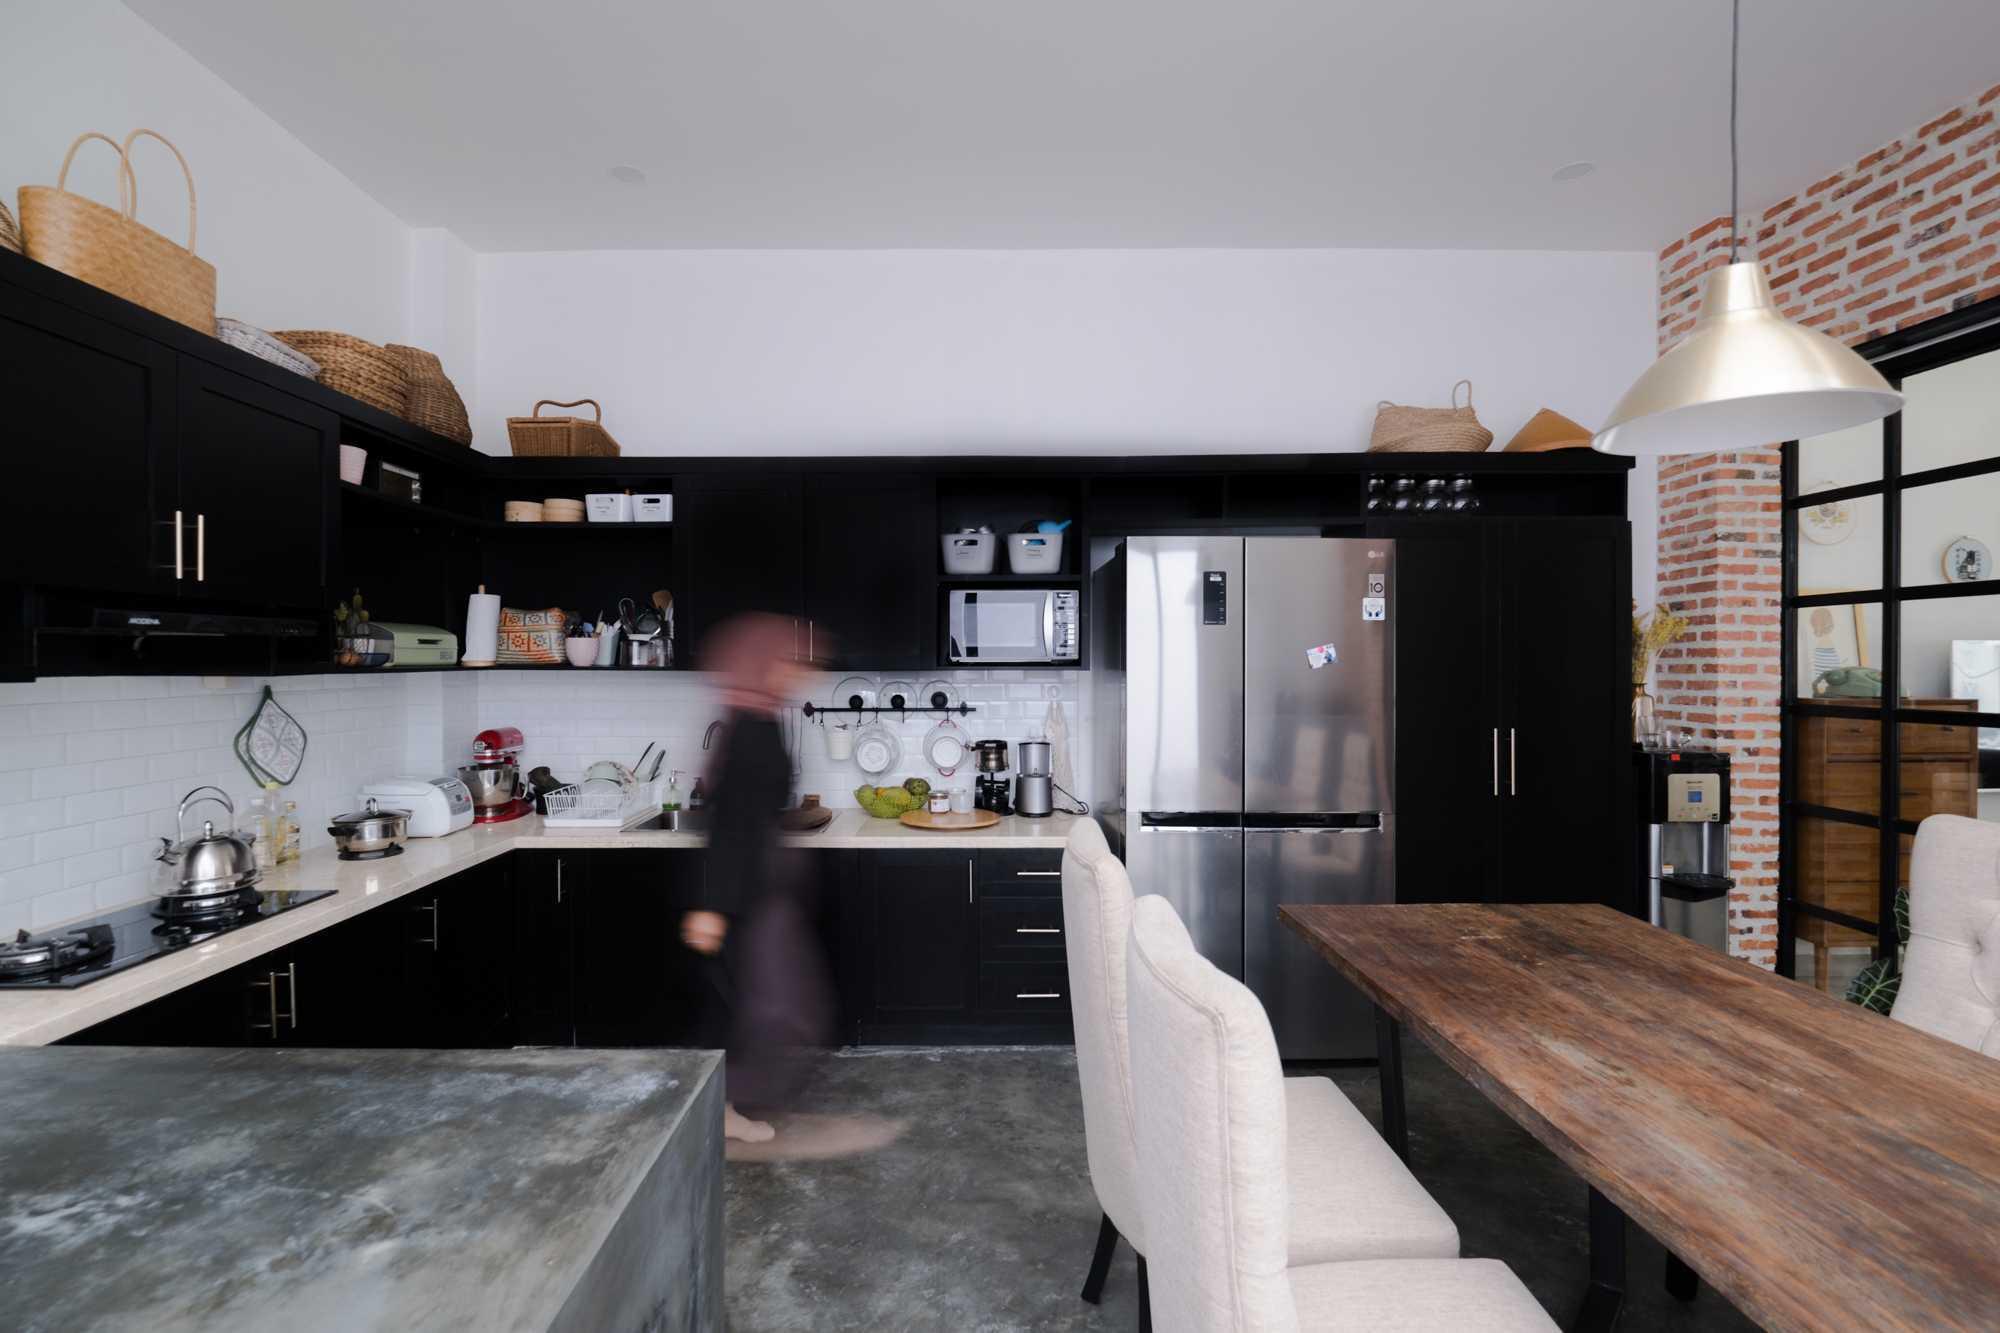 Ruangan Asa Laverde Kitchen Kec. Serpong, Kota Tangerang Selatan, Banten, Indonesia Kec. Serpong, Kota Tangerang Selatan, Banten, Indonesia Ruangan-Asa-Laverde-Kitchen   102893